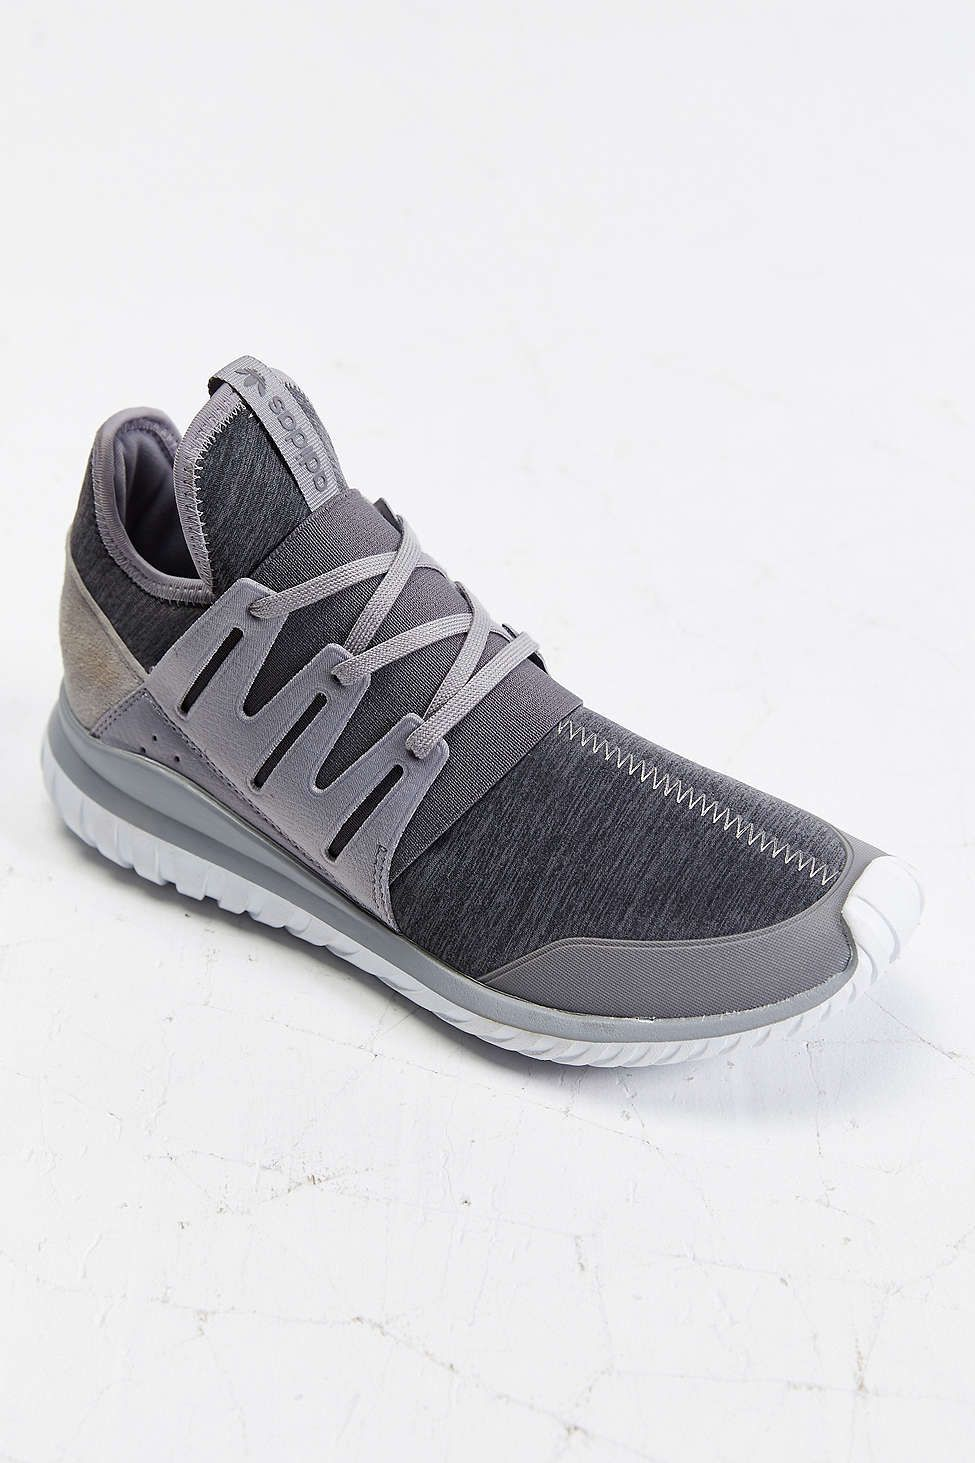 Adidas Tubulare Scarpe Adidas Radiale, Scarpe E Vestiti